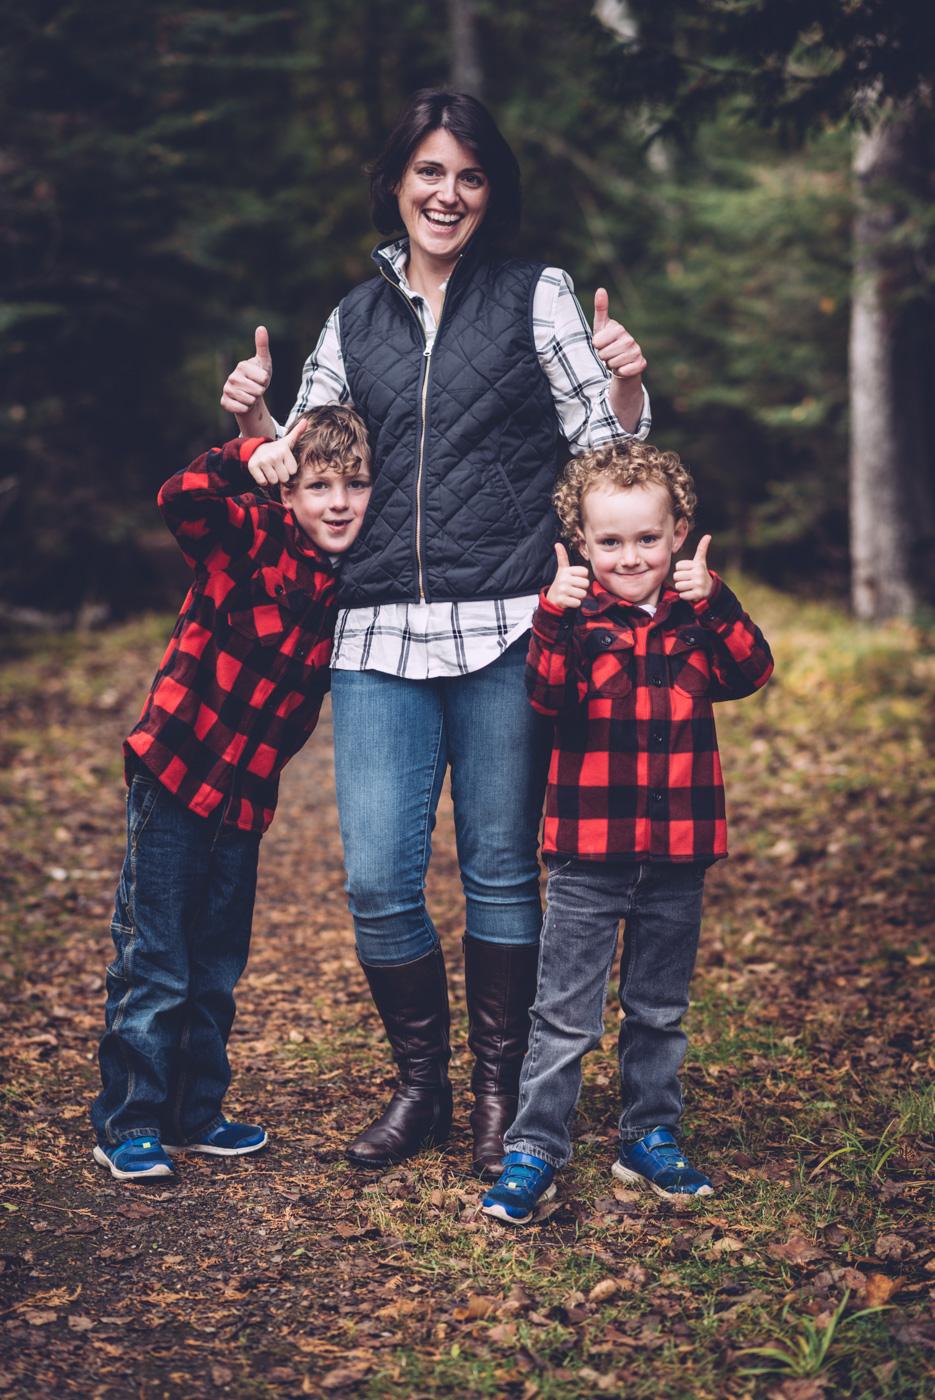 meagan_family_portraits_blog2.jpg